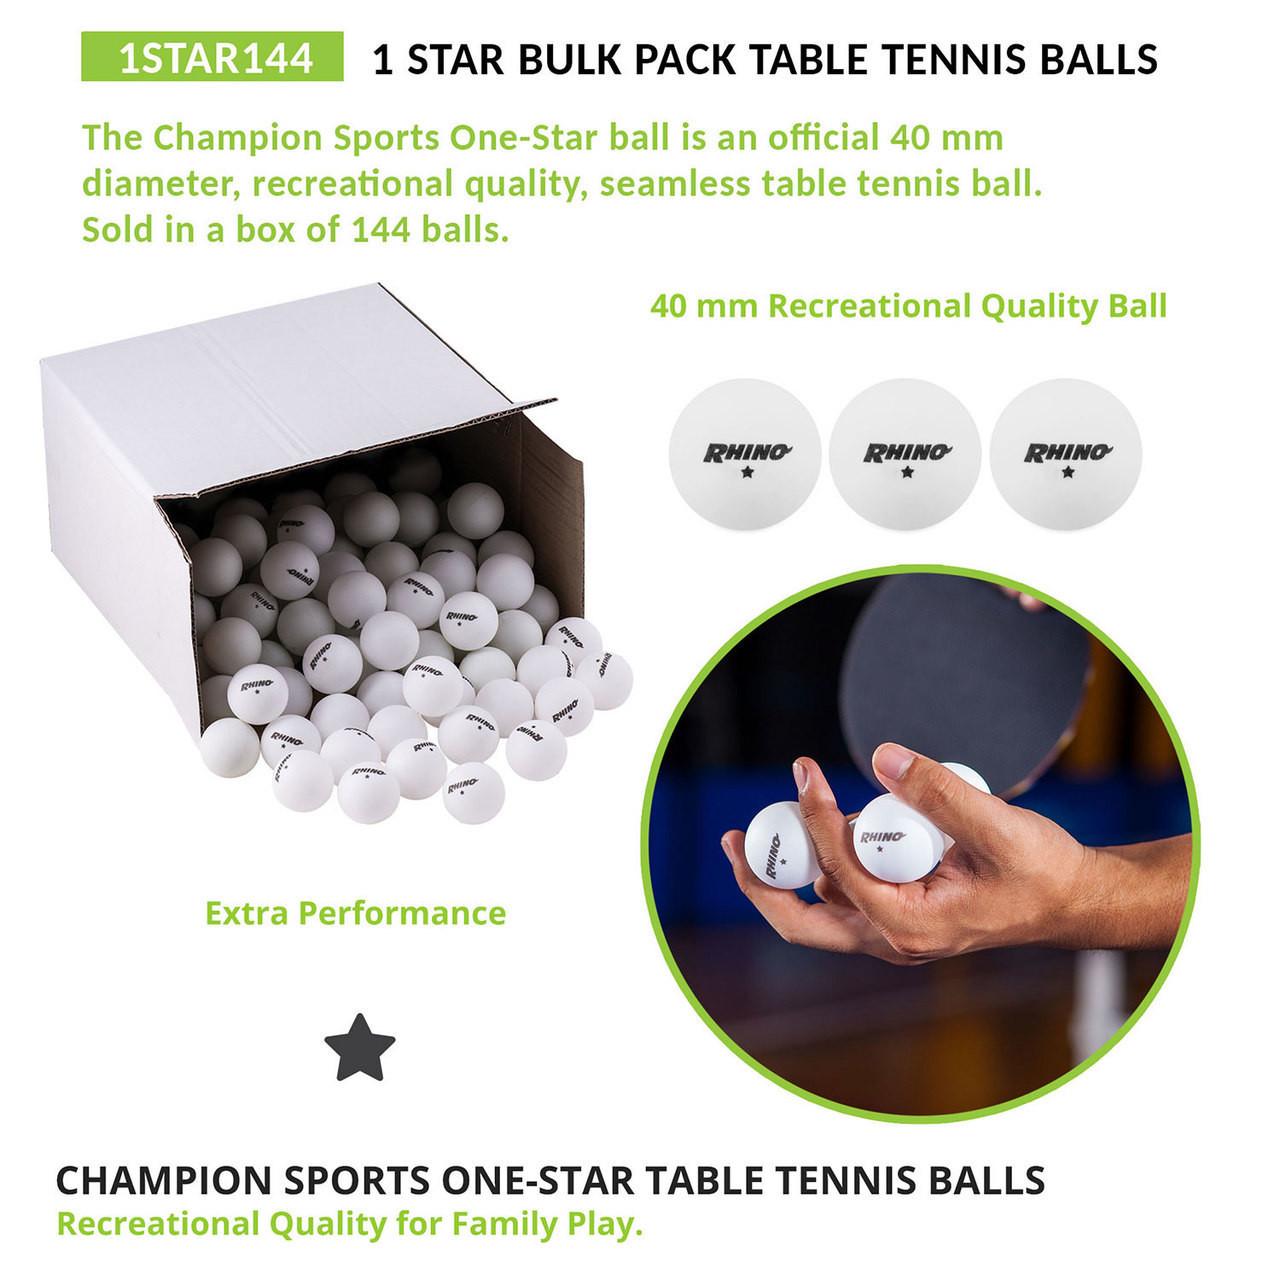 Champion Sports 1 Star Table Tennis Balls - 1 Gross